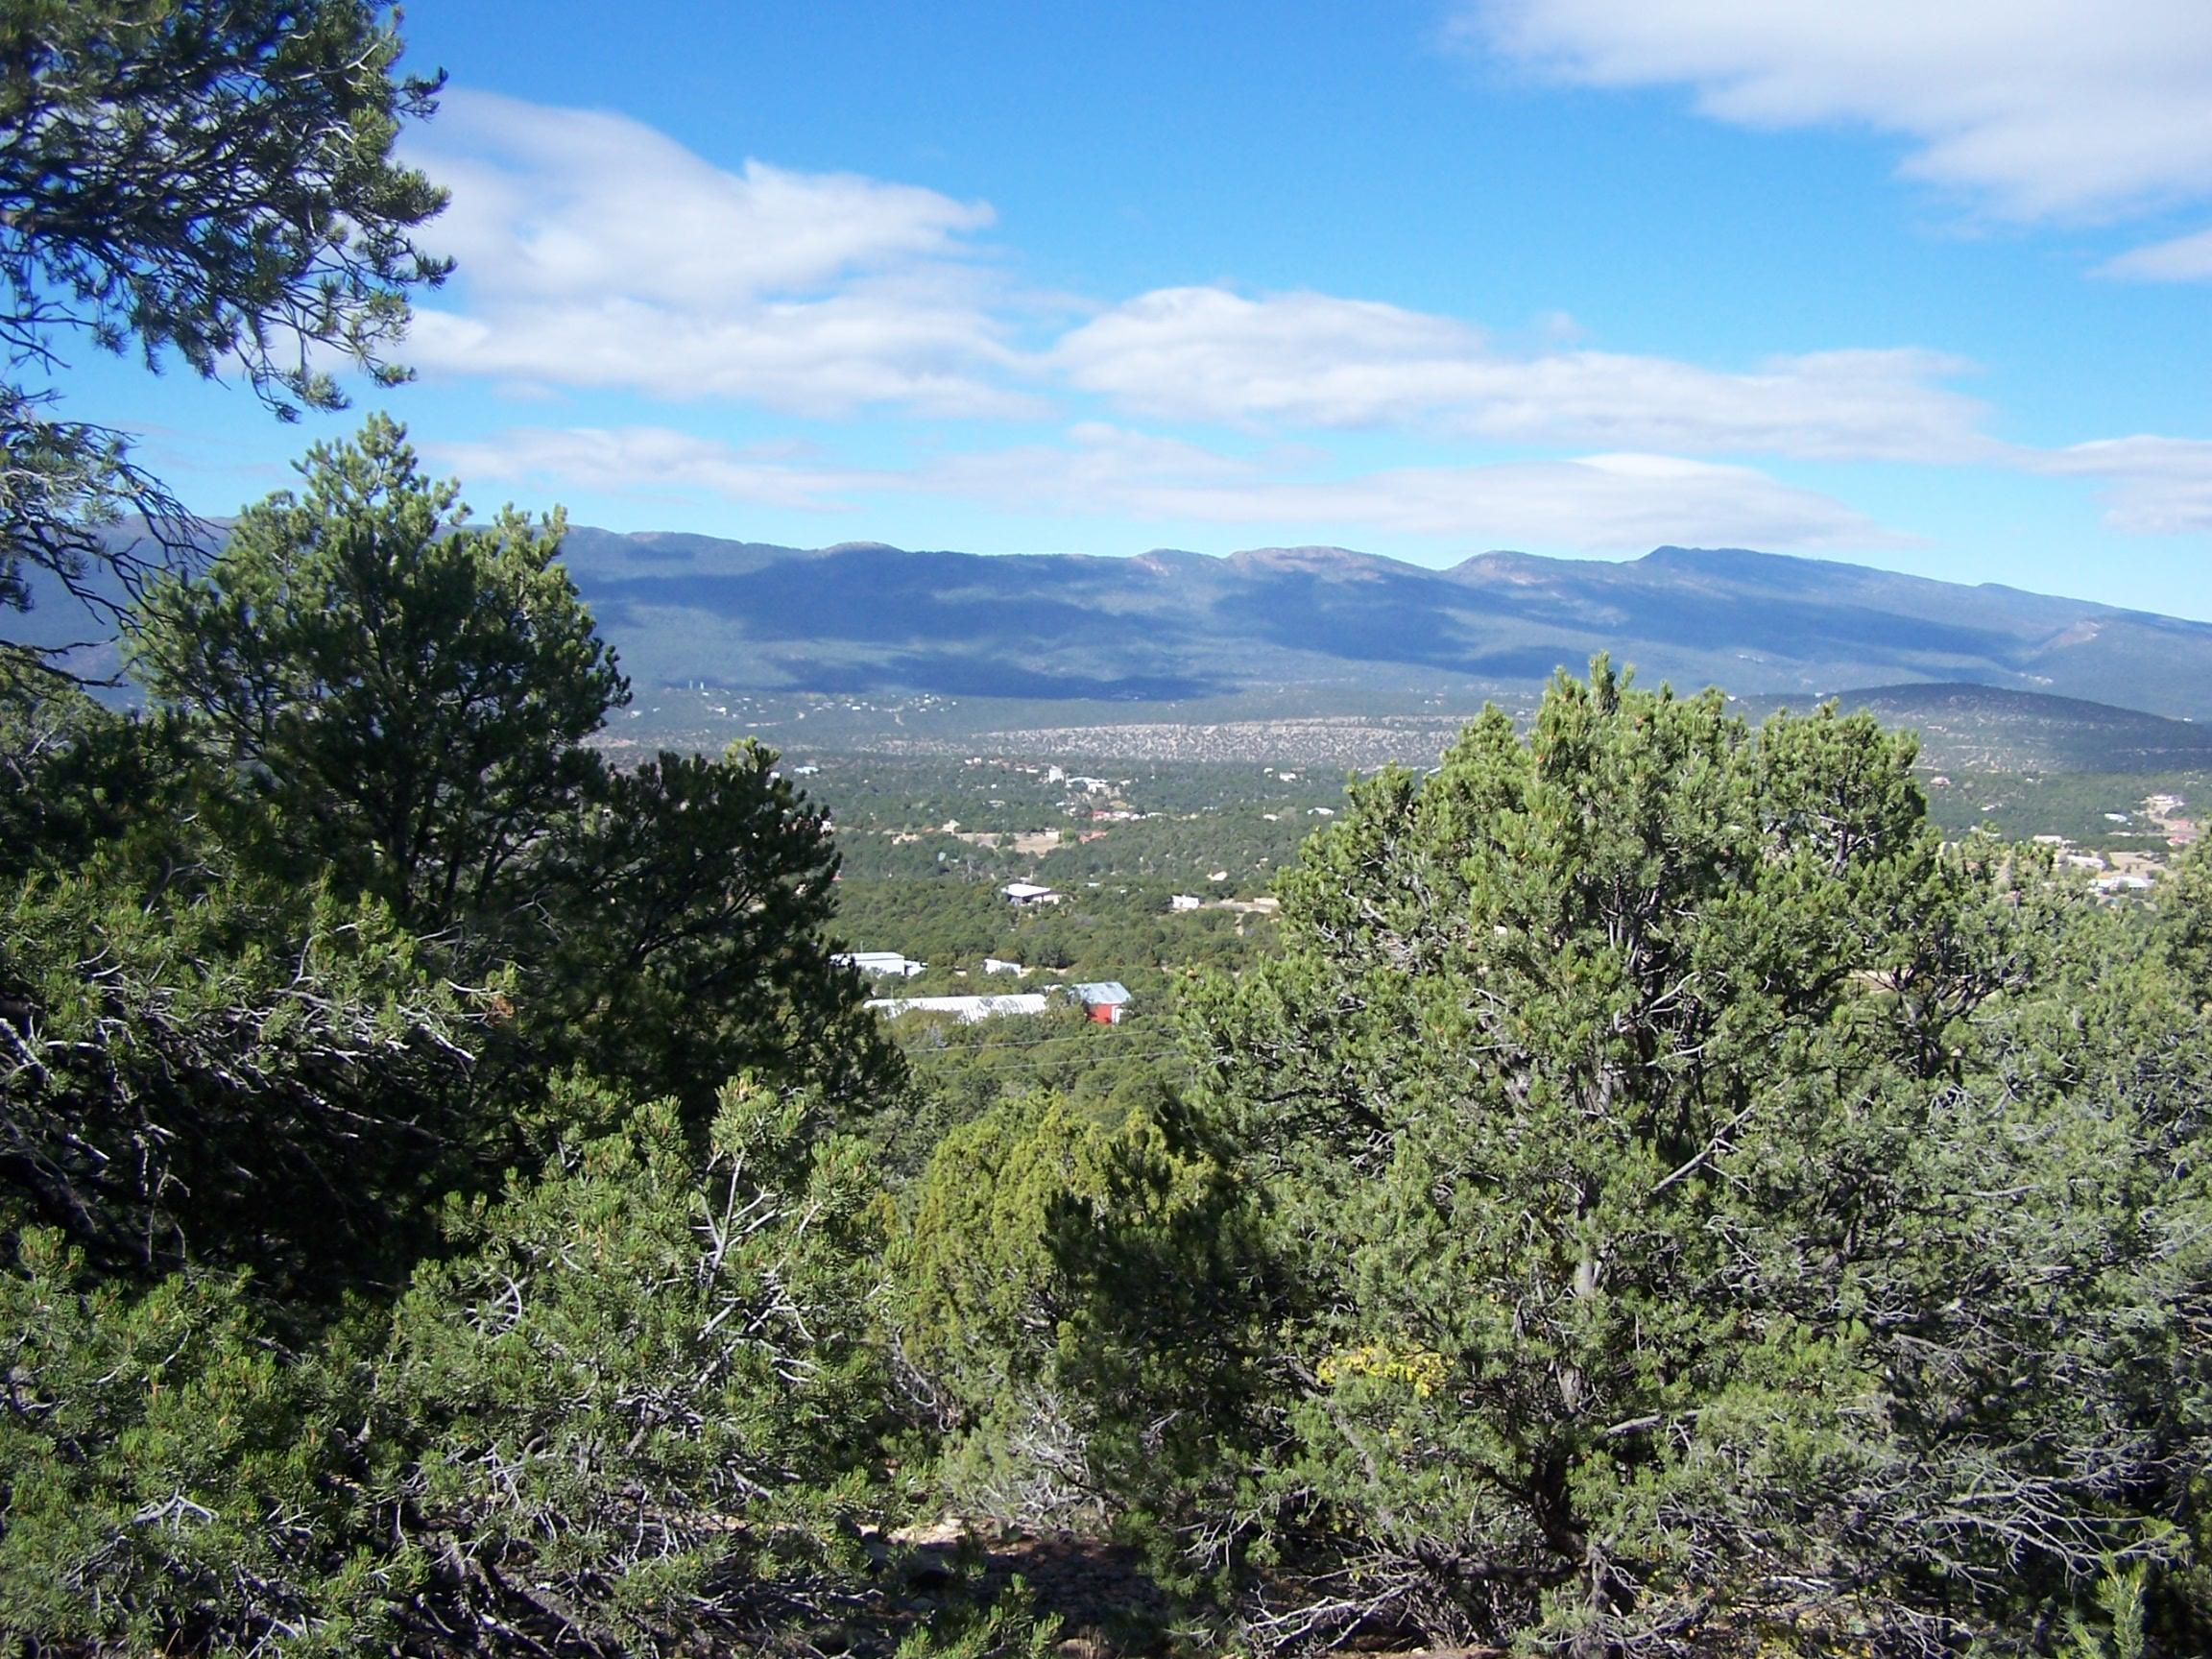 KIMBERLY LANE, Tijeras, NM 87059 - Tijeras, NM real estate listing